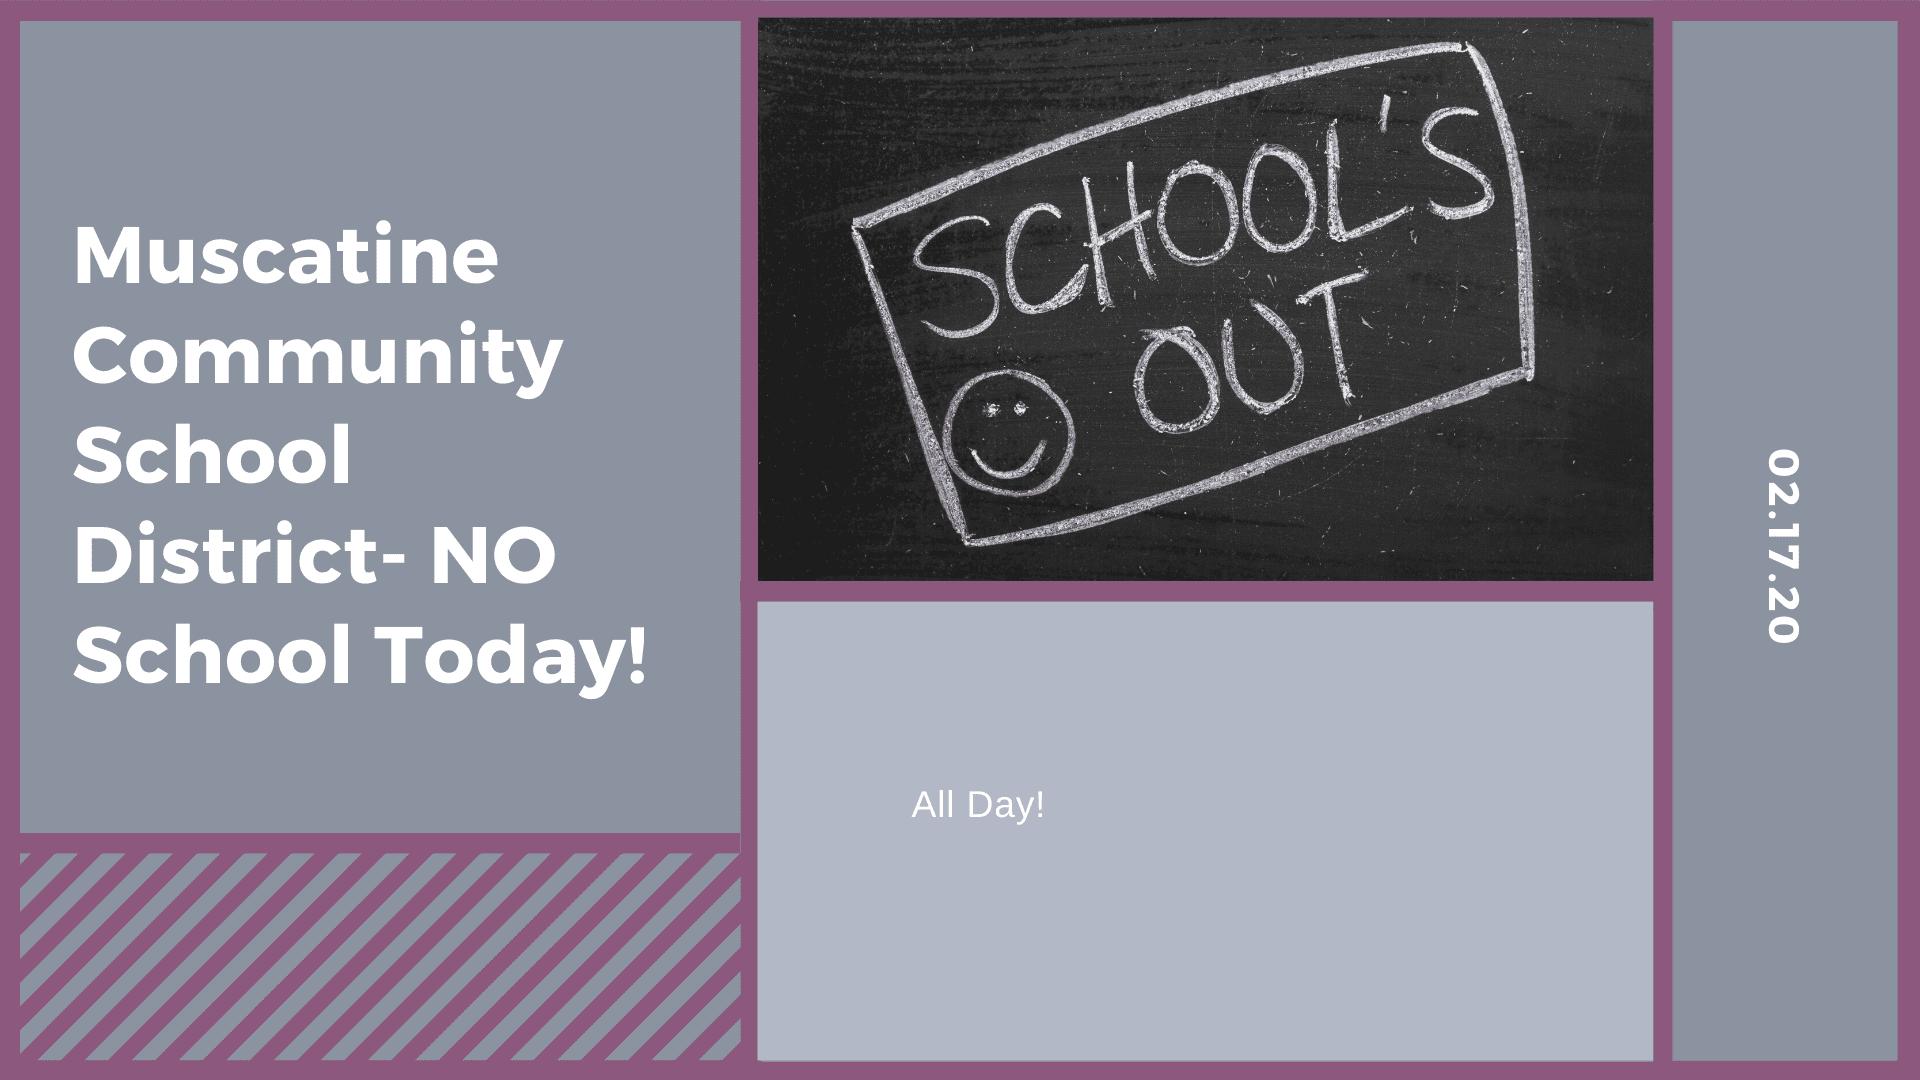 Muscatine Community School District- NO School Today!